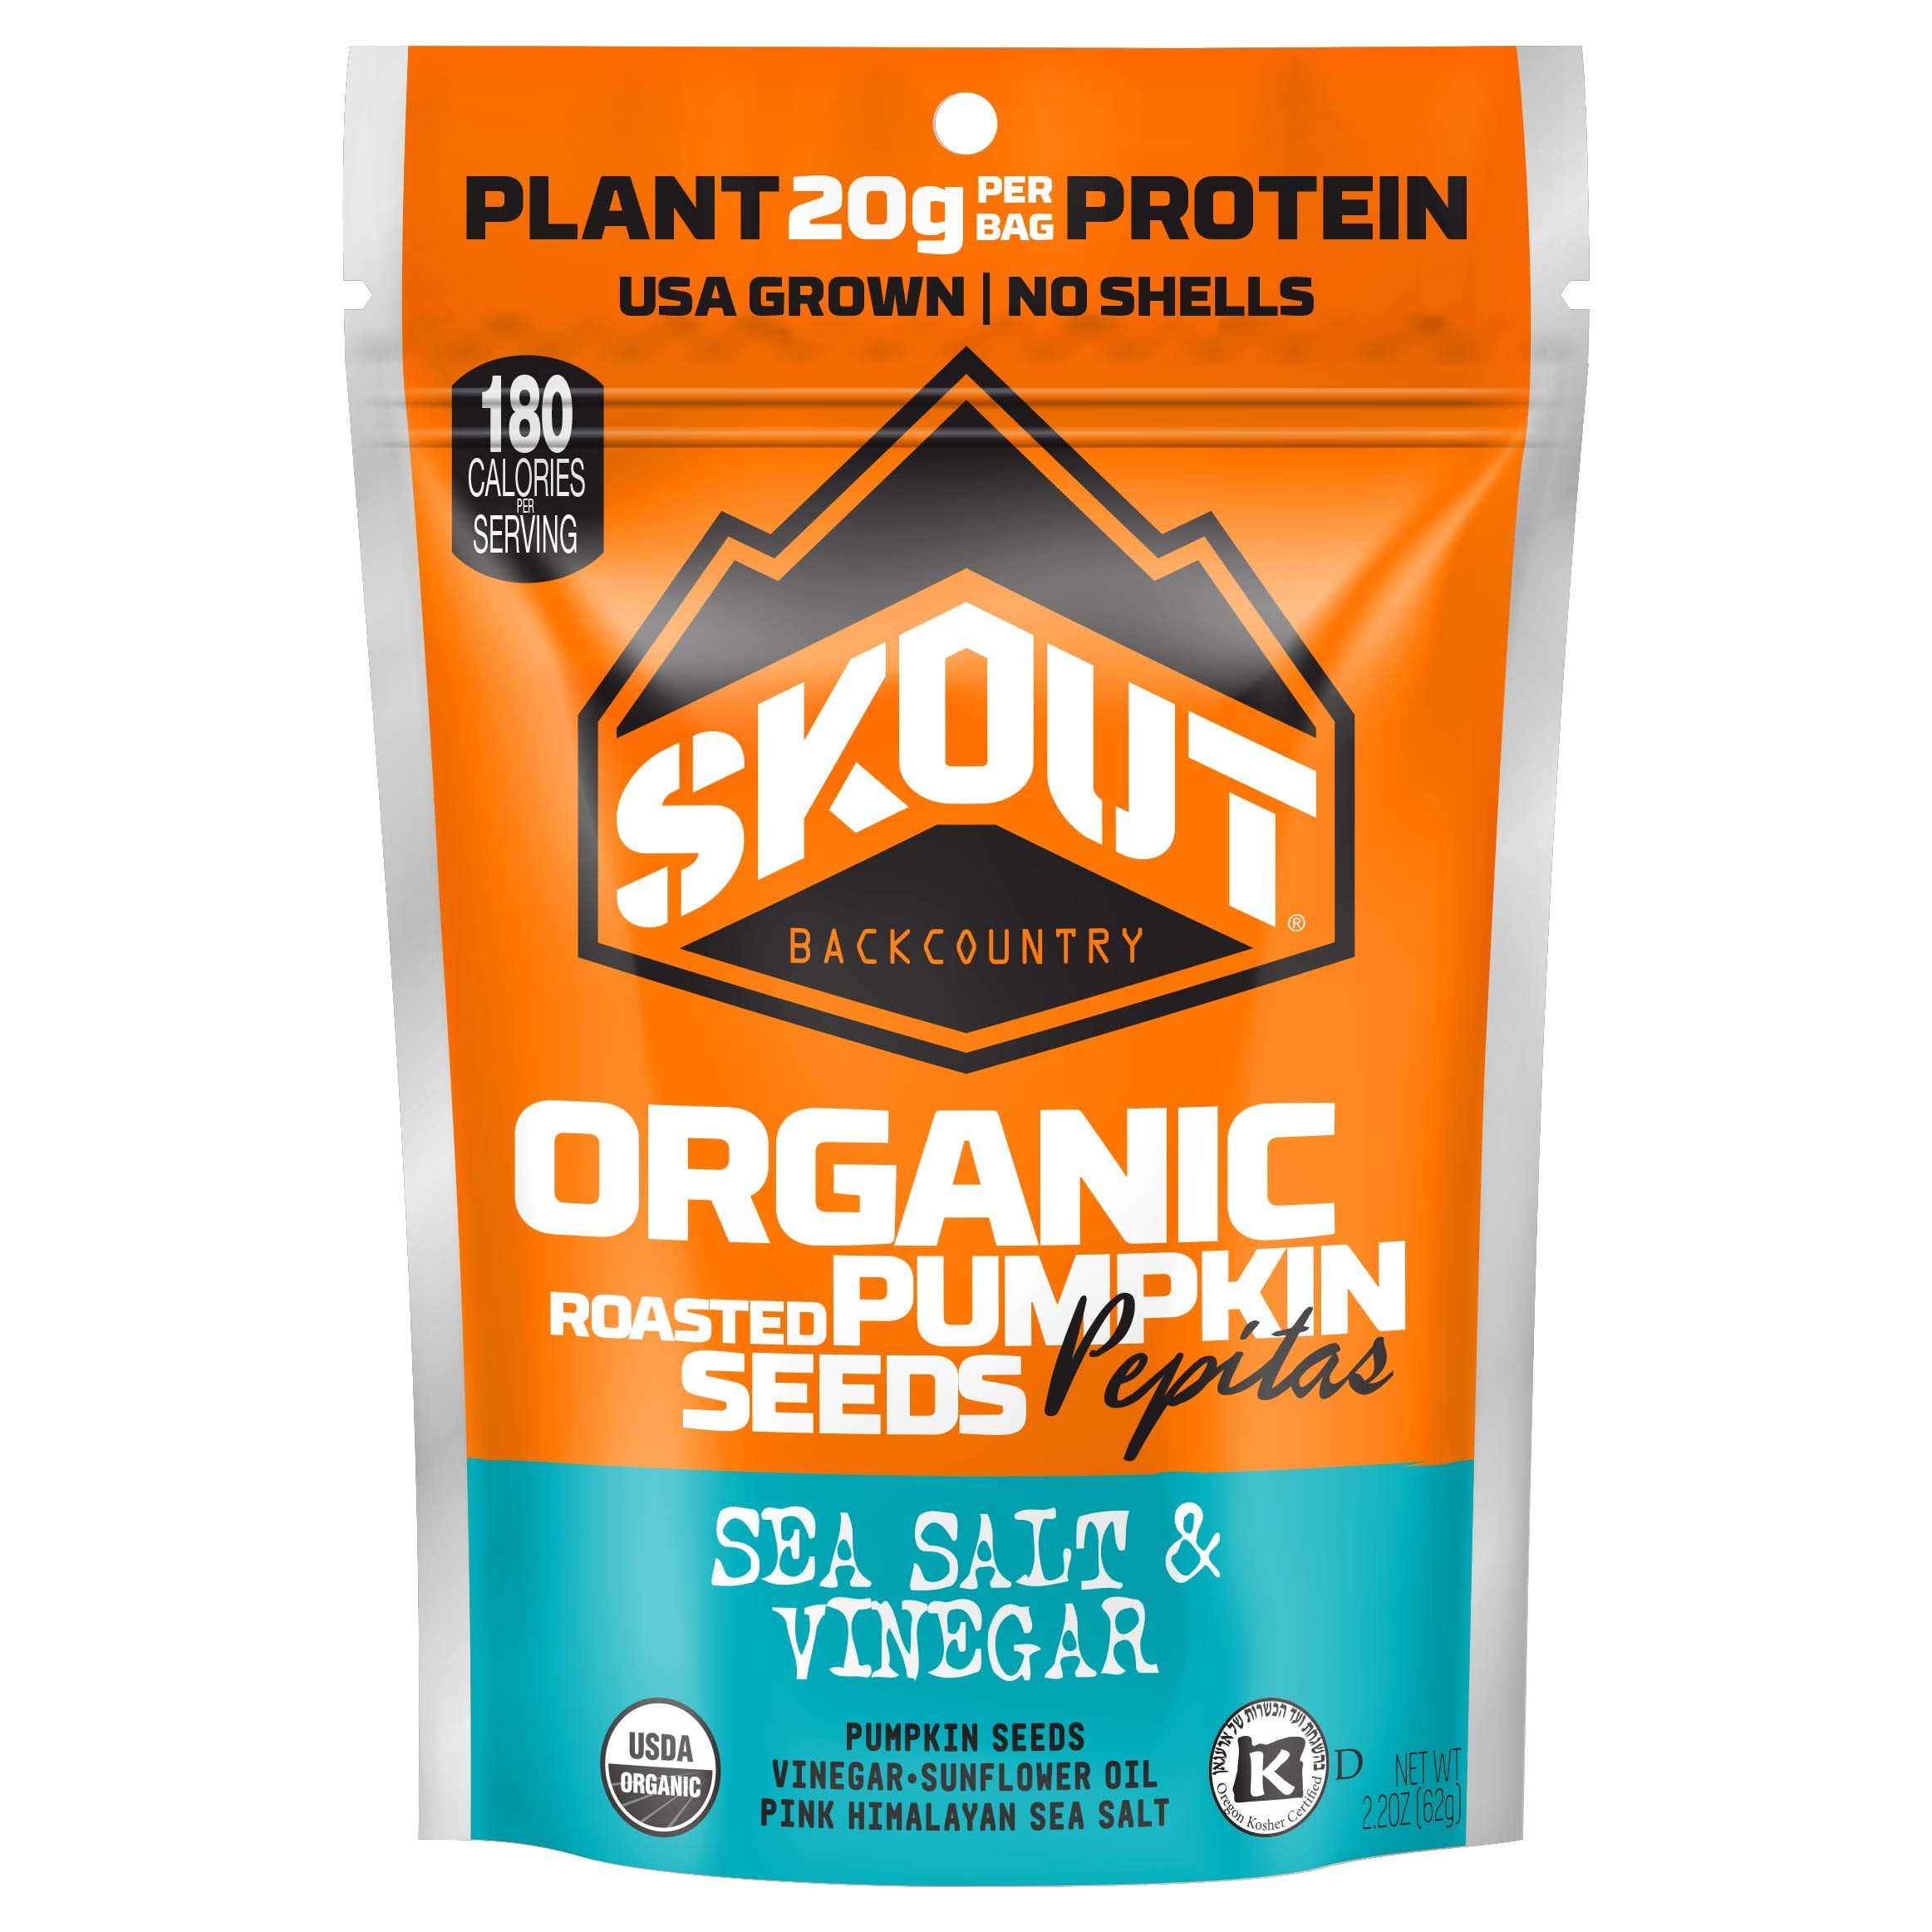 SKOUT Organic Roasted Pumpkin Seeds - Sea Salt & Vinegar - Pepitas With No Shell - Vegan, Low Carb Snacks - Paleo Foods - Gluten Free - Non-GMO - Kosher - Grown in USA - 2.2 oz (6 Count)